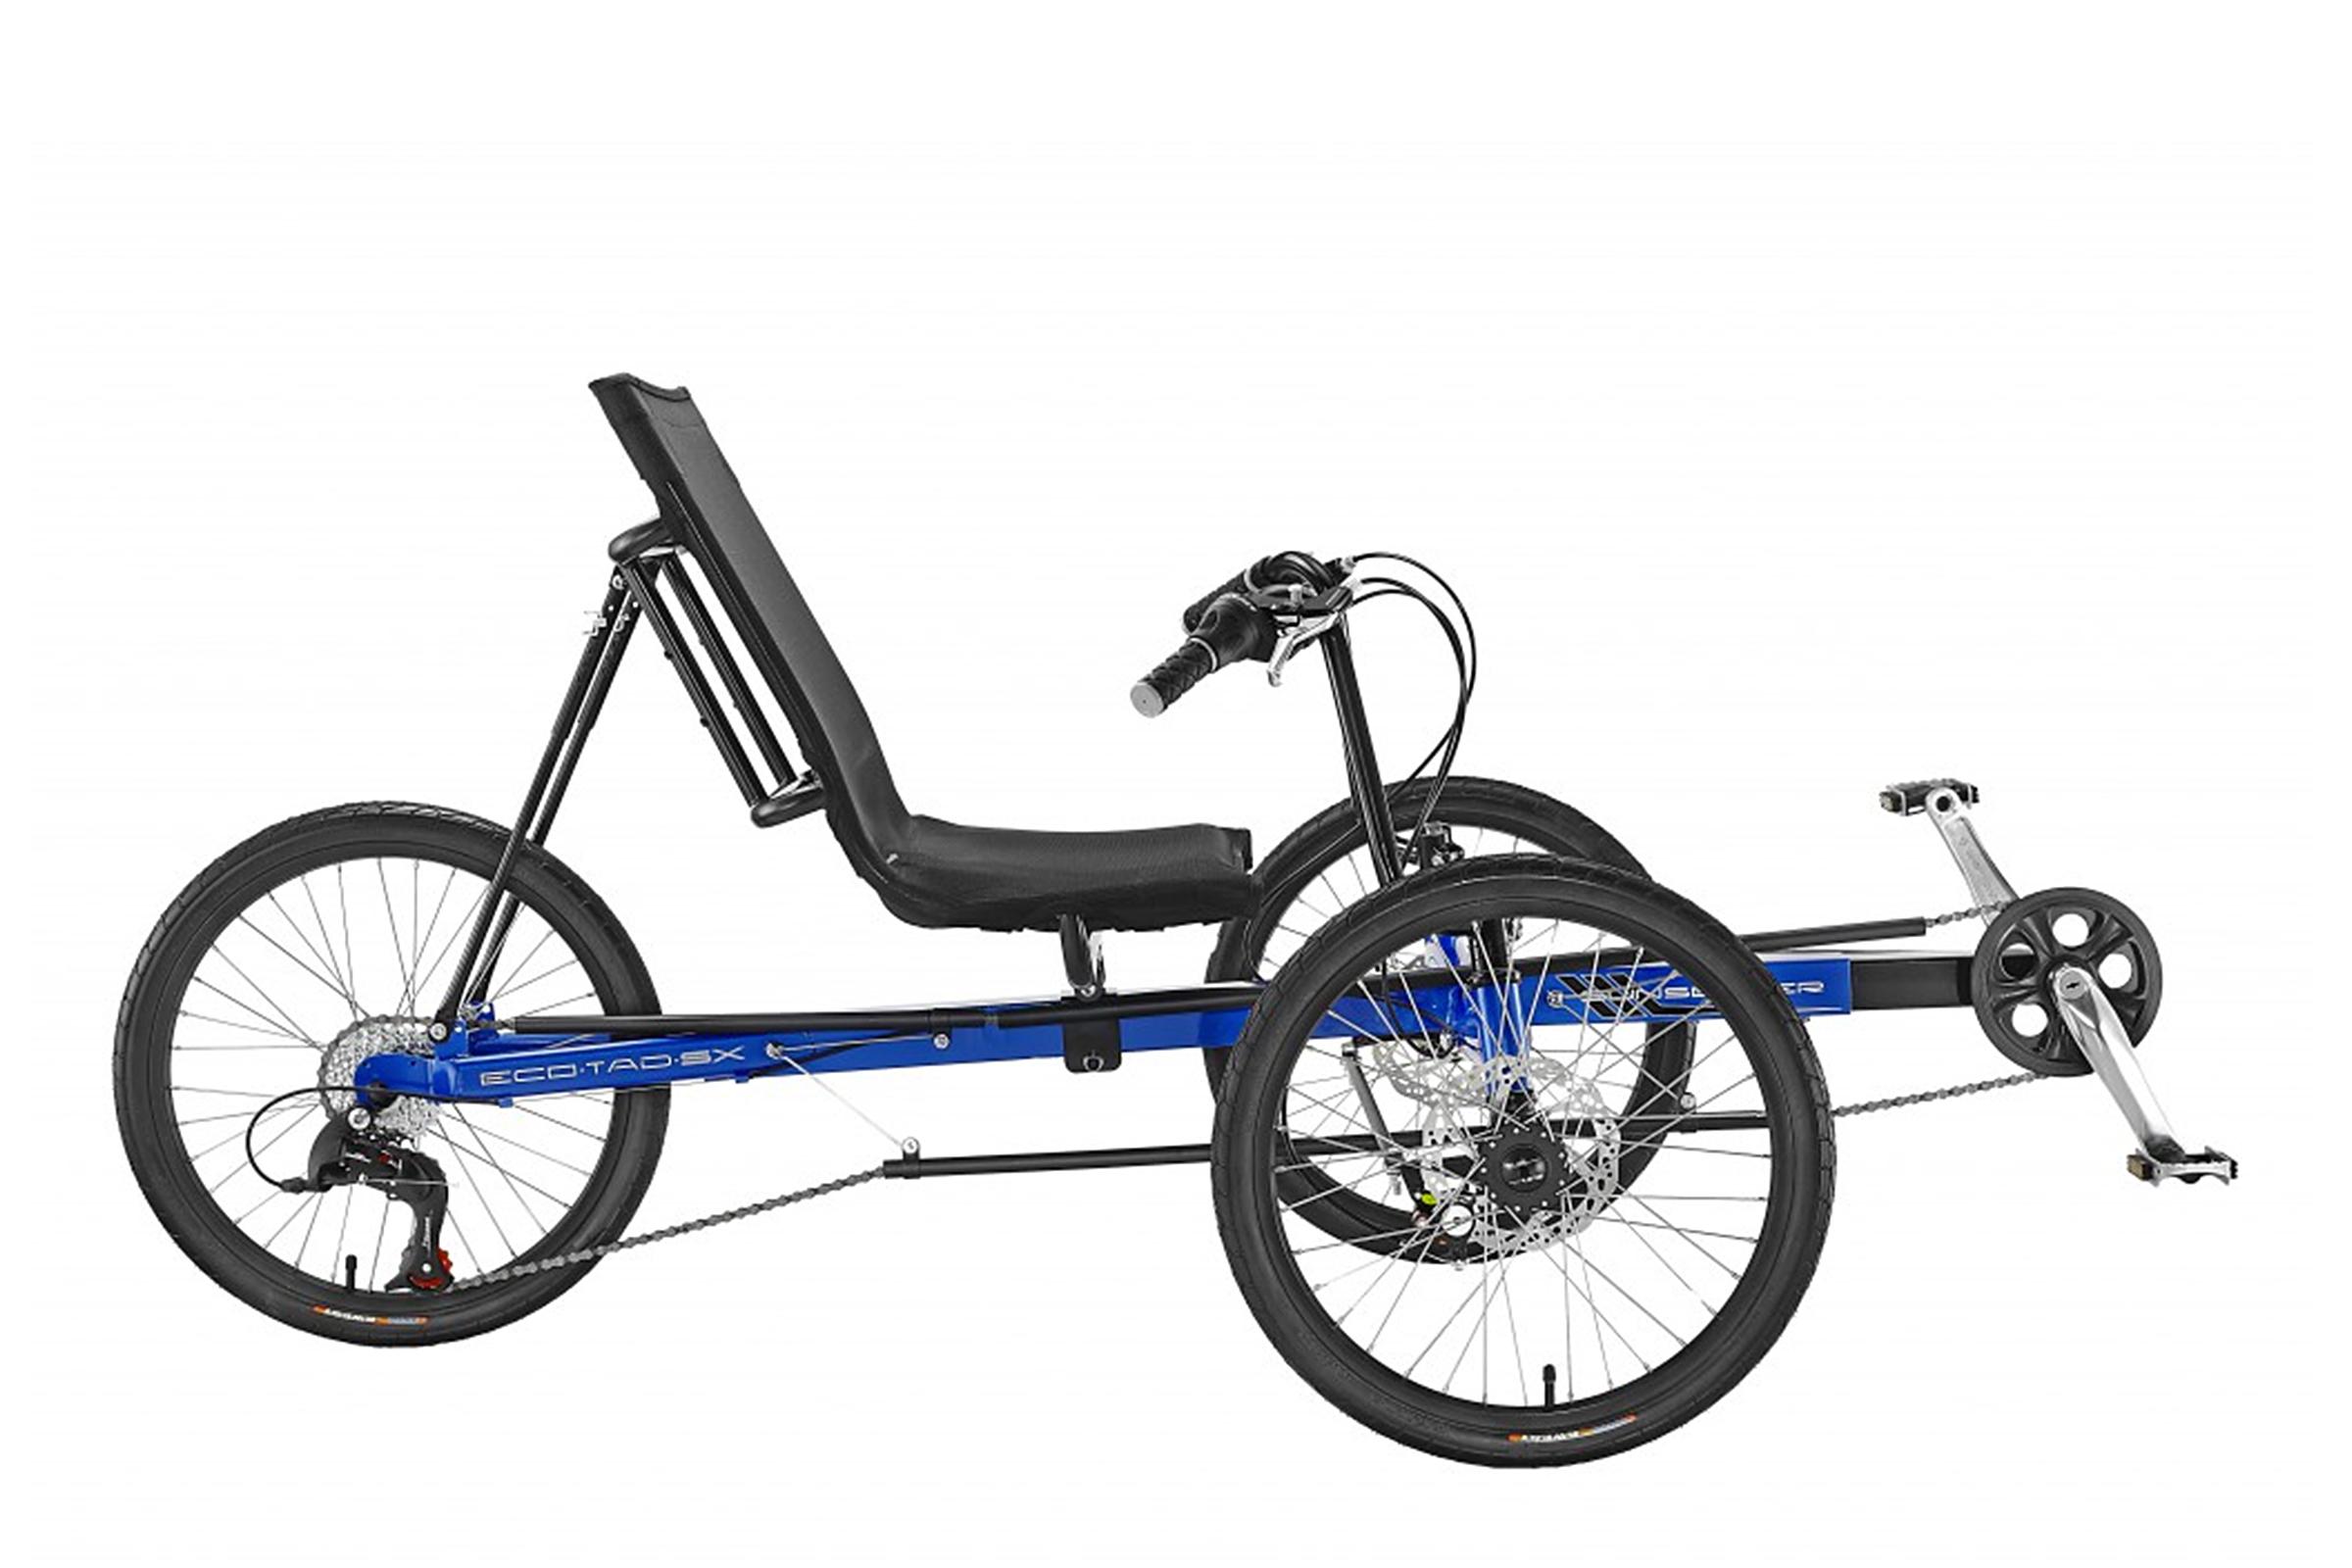 Eco Tad Sx Sun Seeker Bicycles